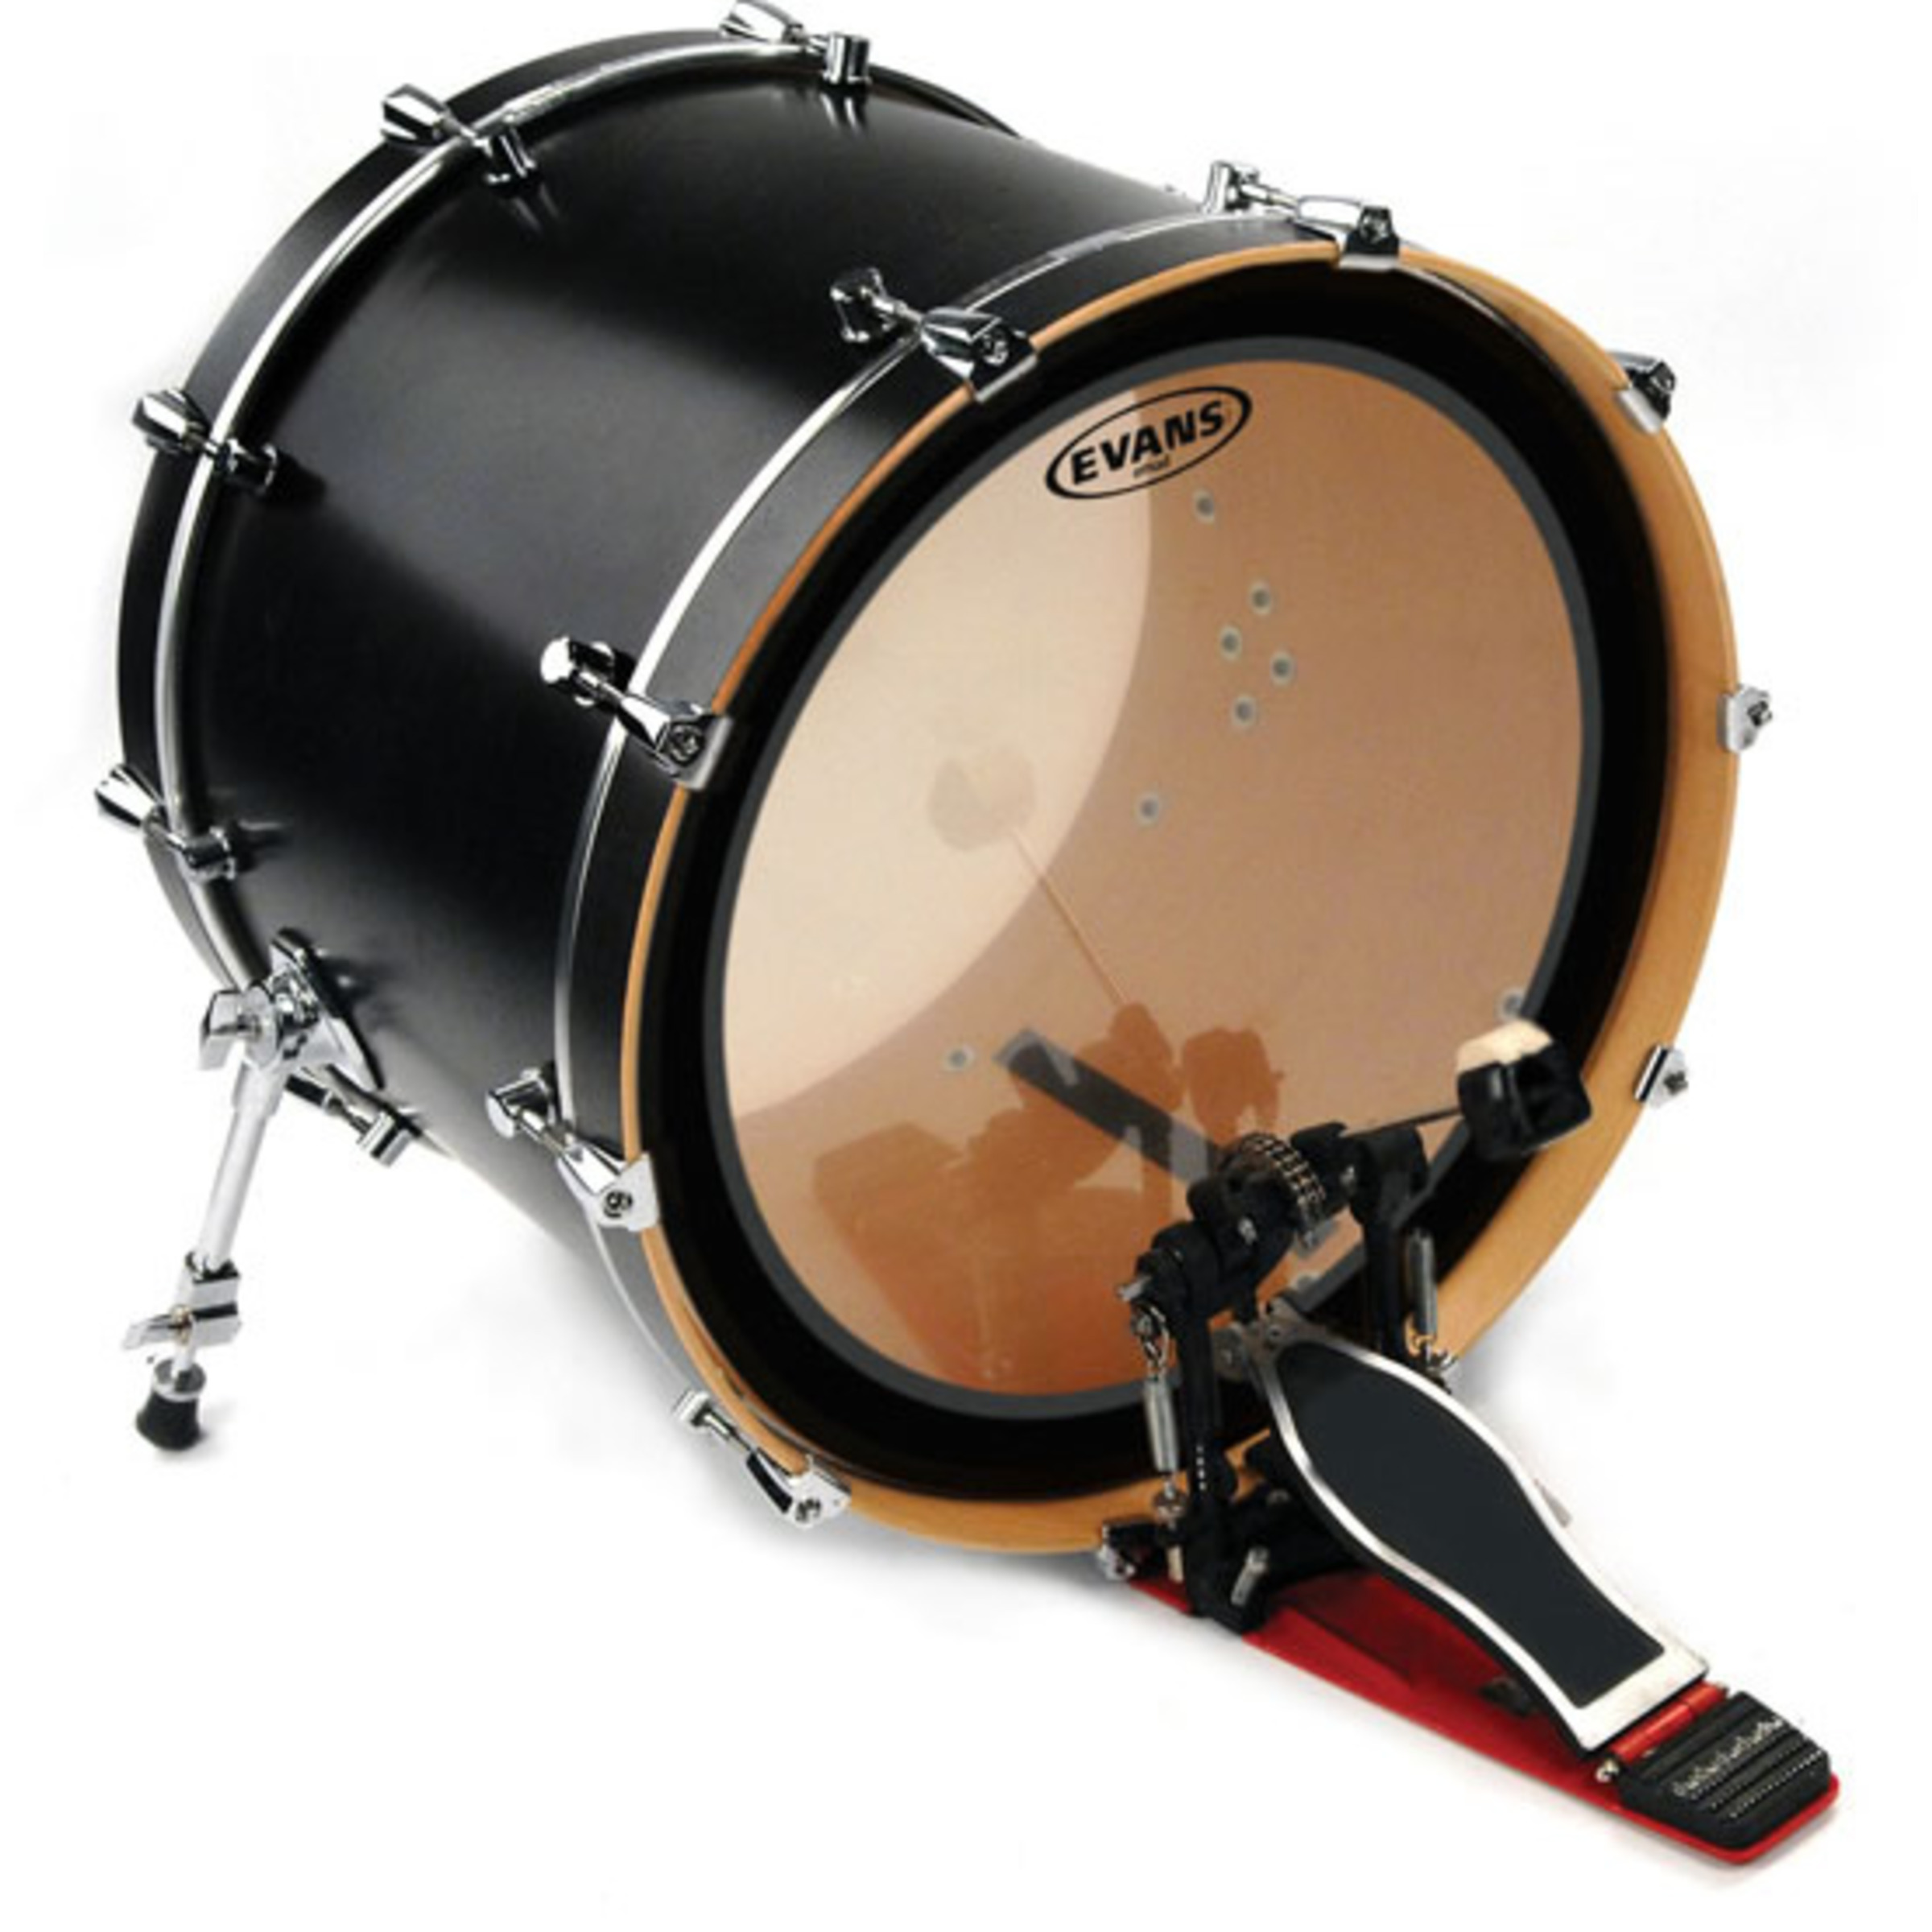 evans gmad clear bass drum batter head giggear. Black Bedroom Furniture Sets. Home Design Ideas